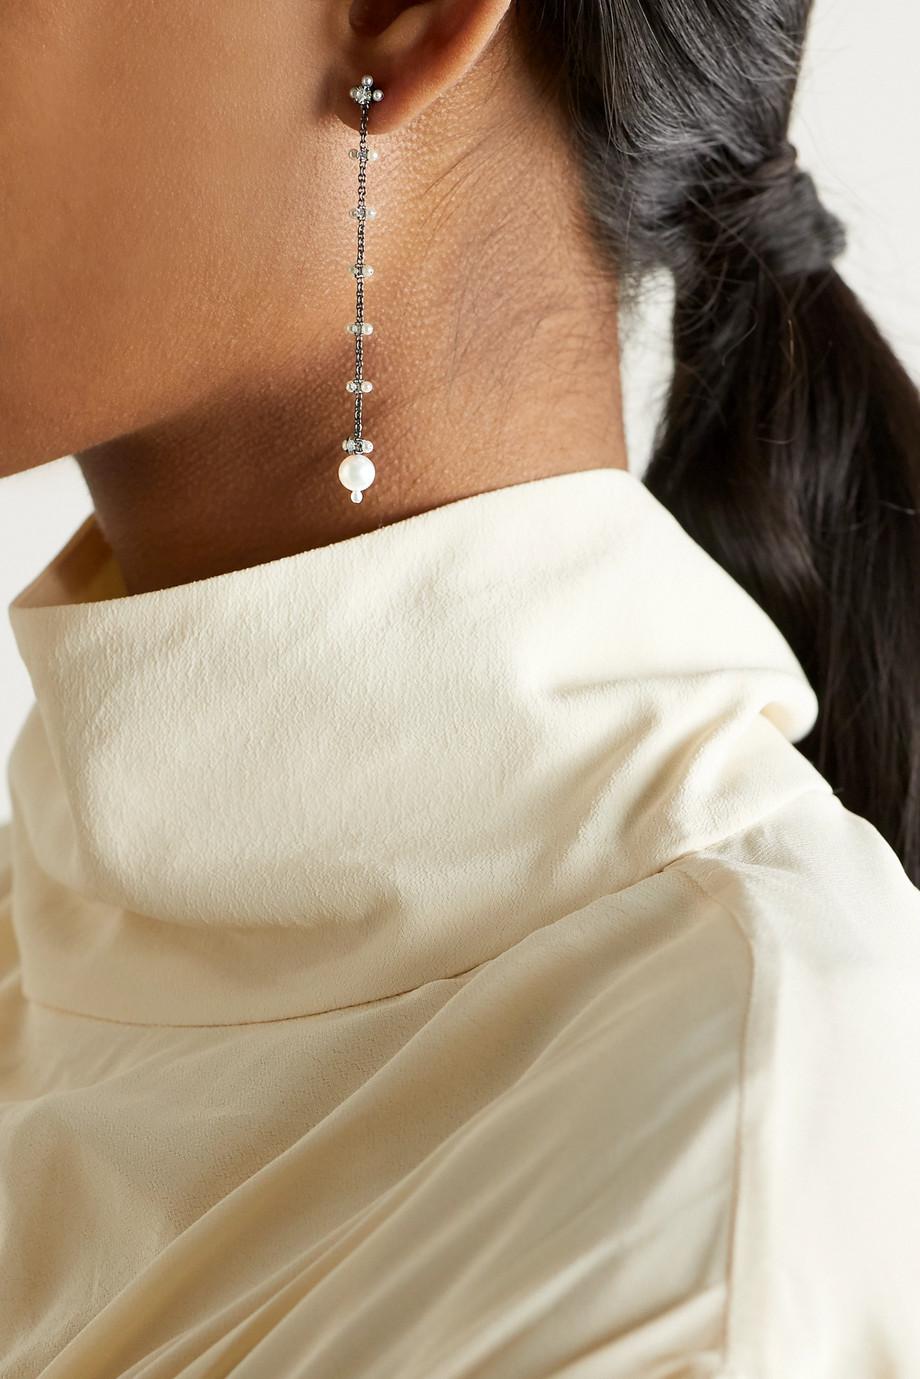 Nadia Morgenthaler + NET SUSTAIN 18-karat blackened white gold, pearl and diamond earrings